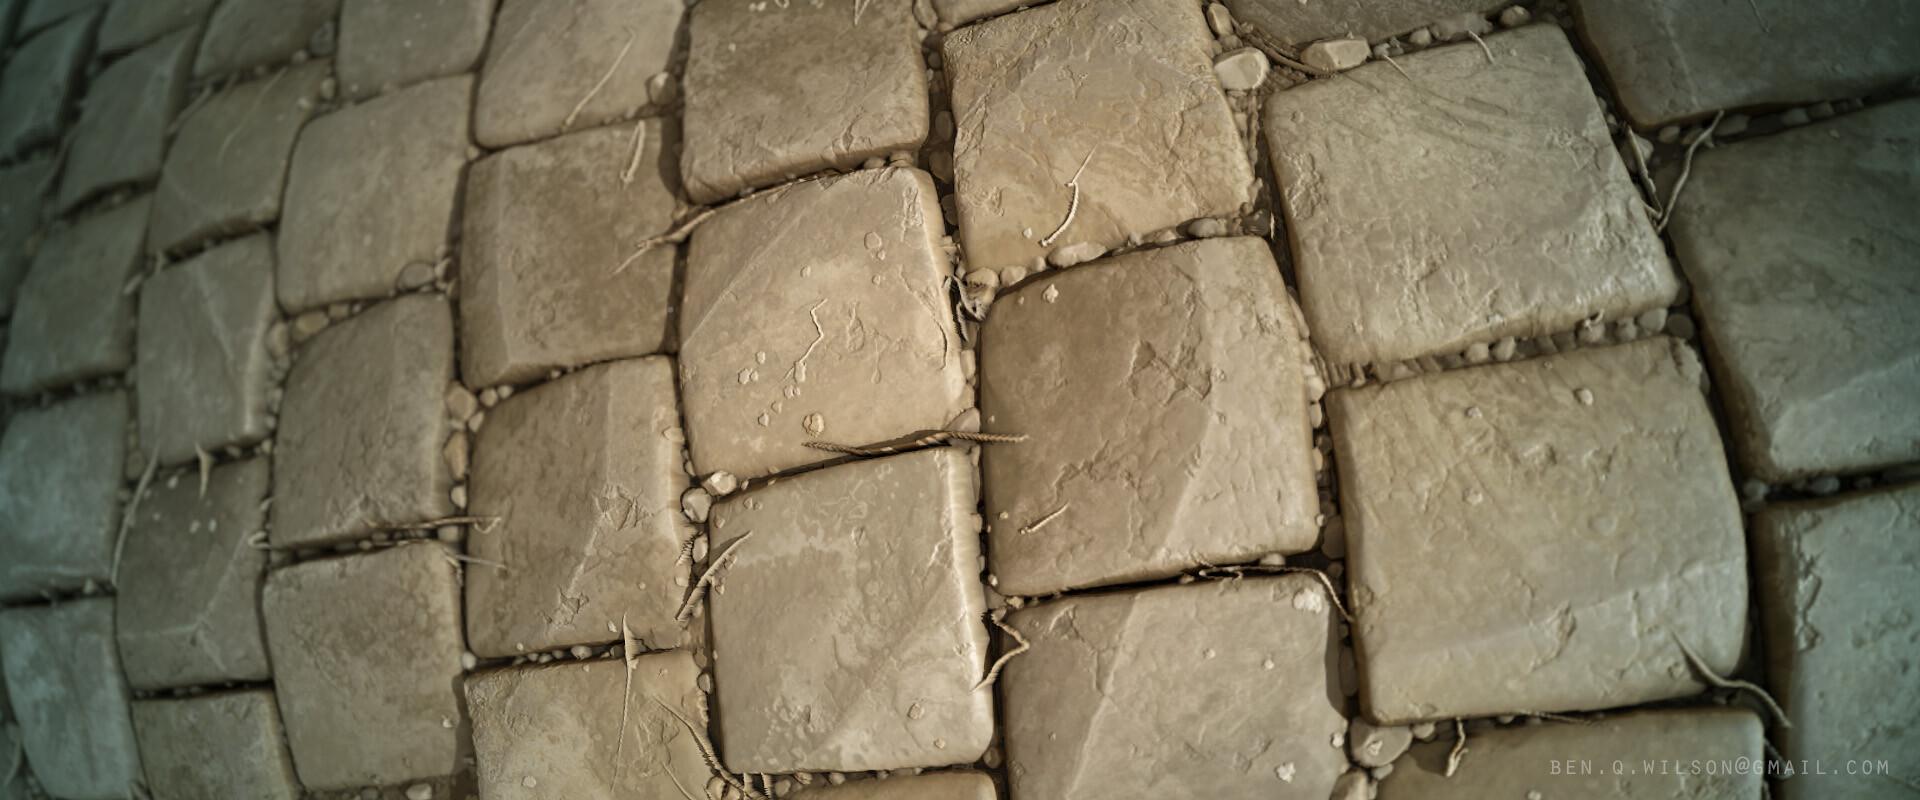 Ben wilson cobblestone a 02 2